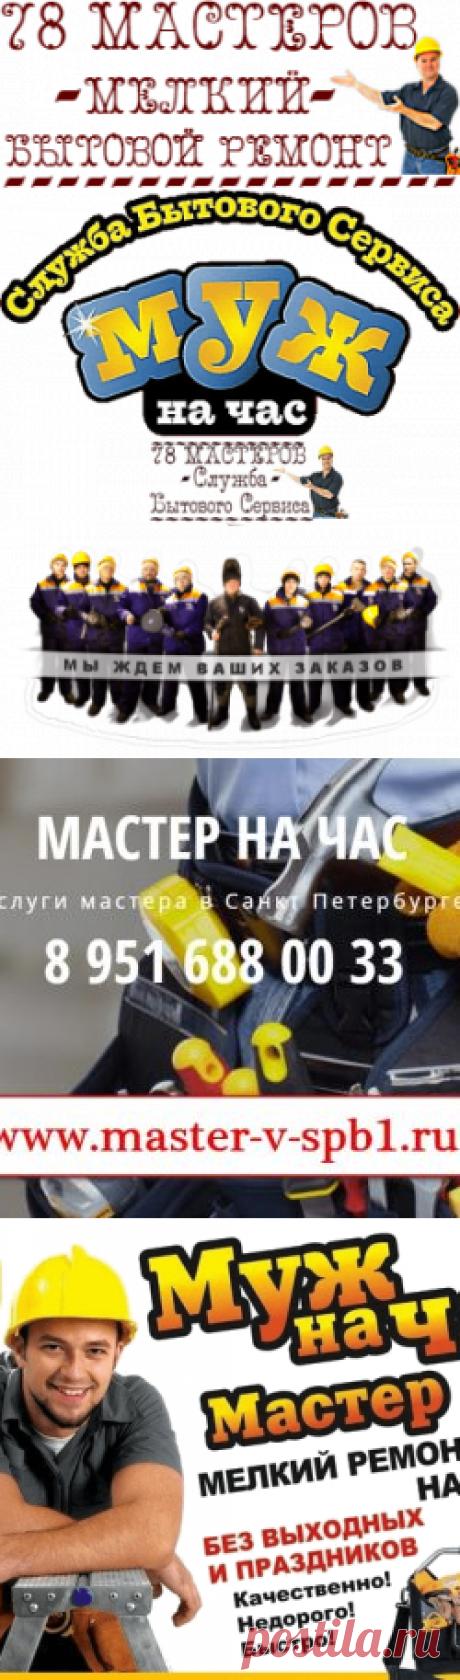 Муж на час | 78 Мастеров | Мелкий ремонт СПб | Муж на час СПб